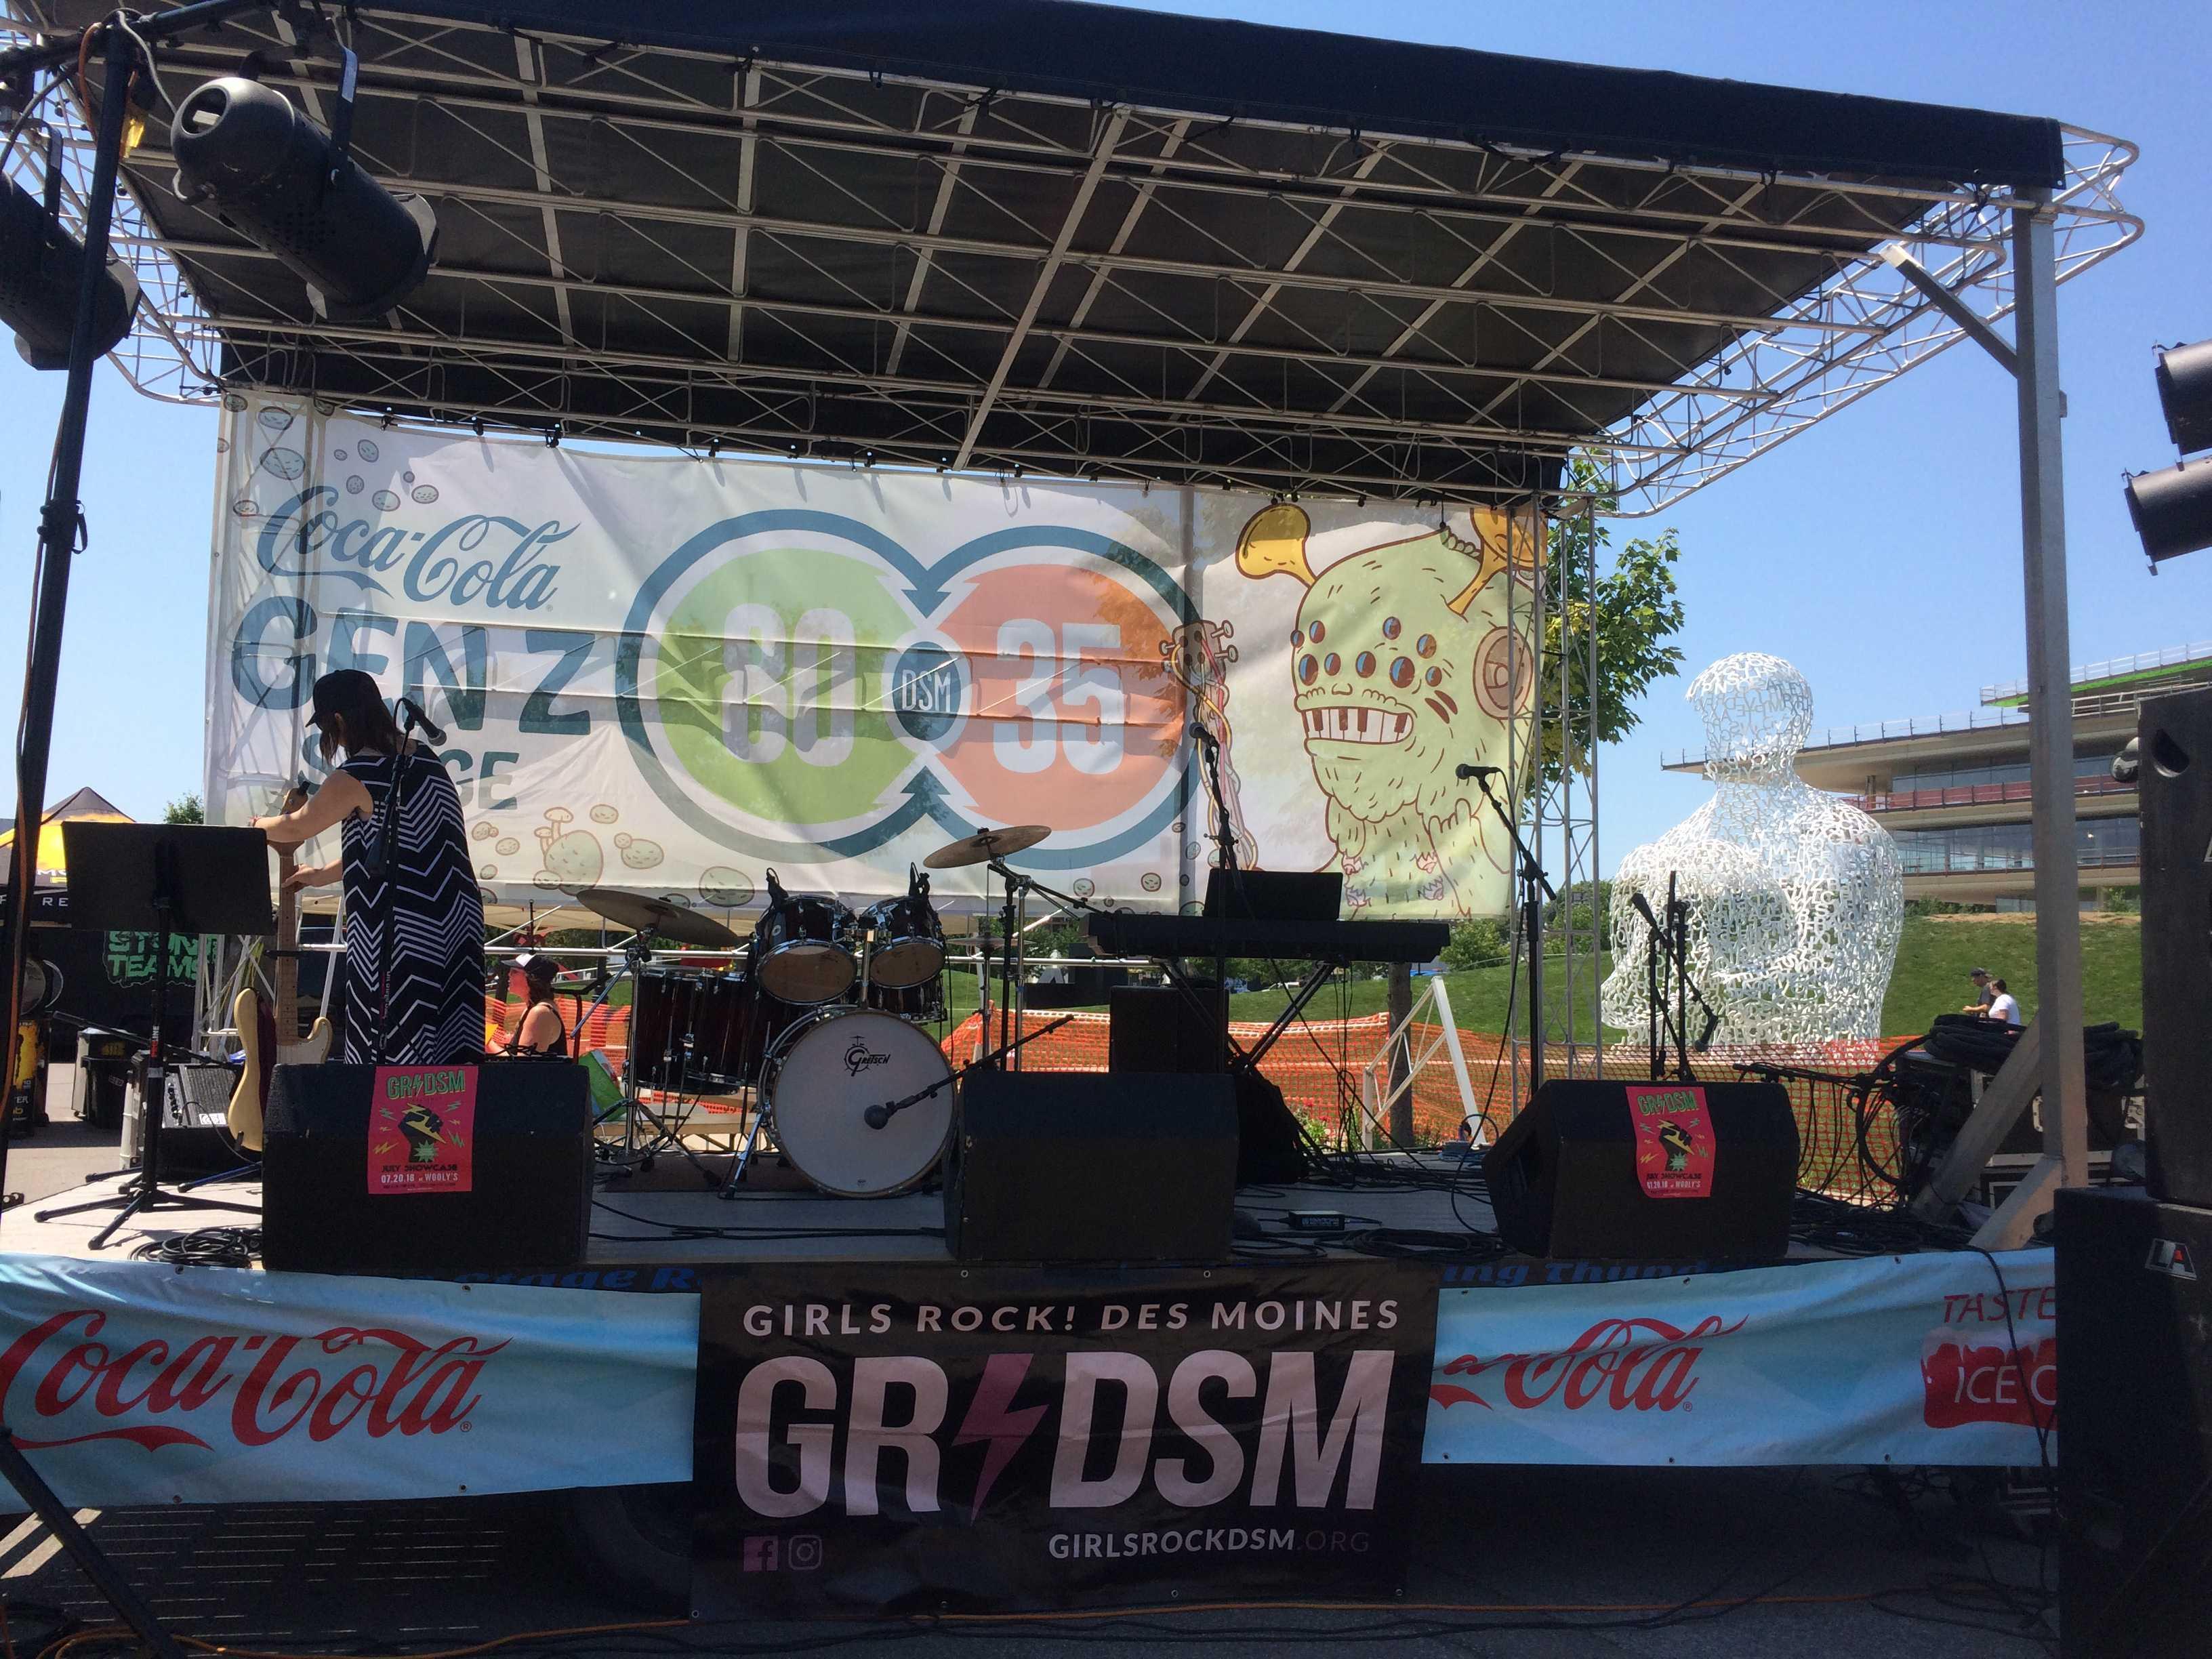 80/35 gives a musical platform for an organization empowering girls